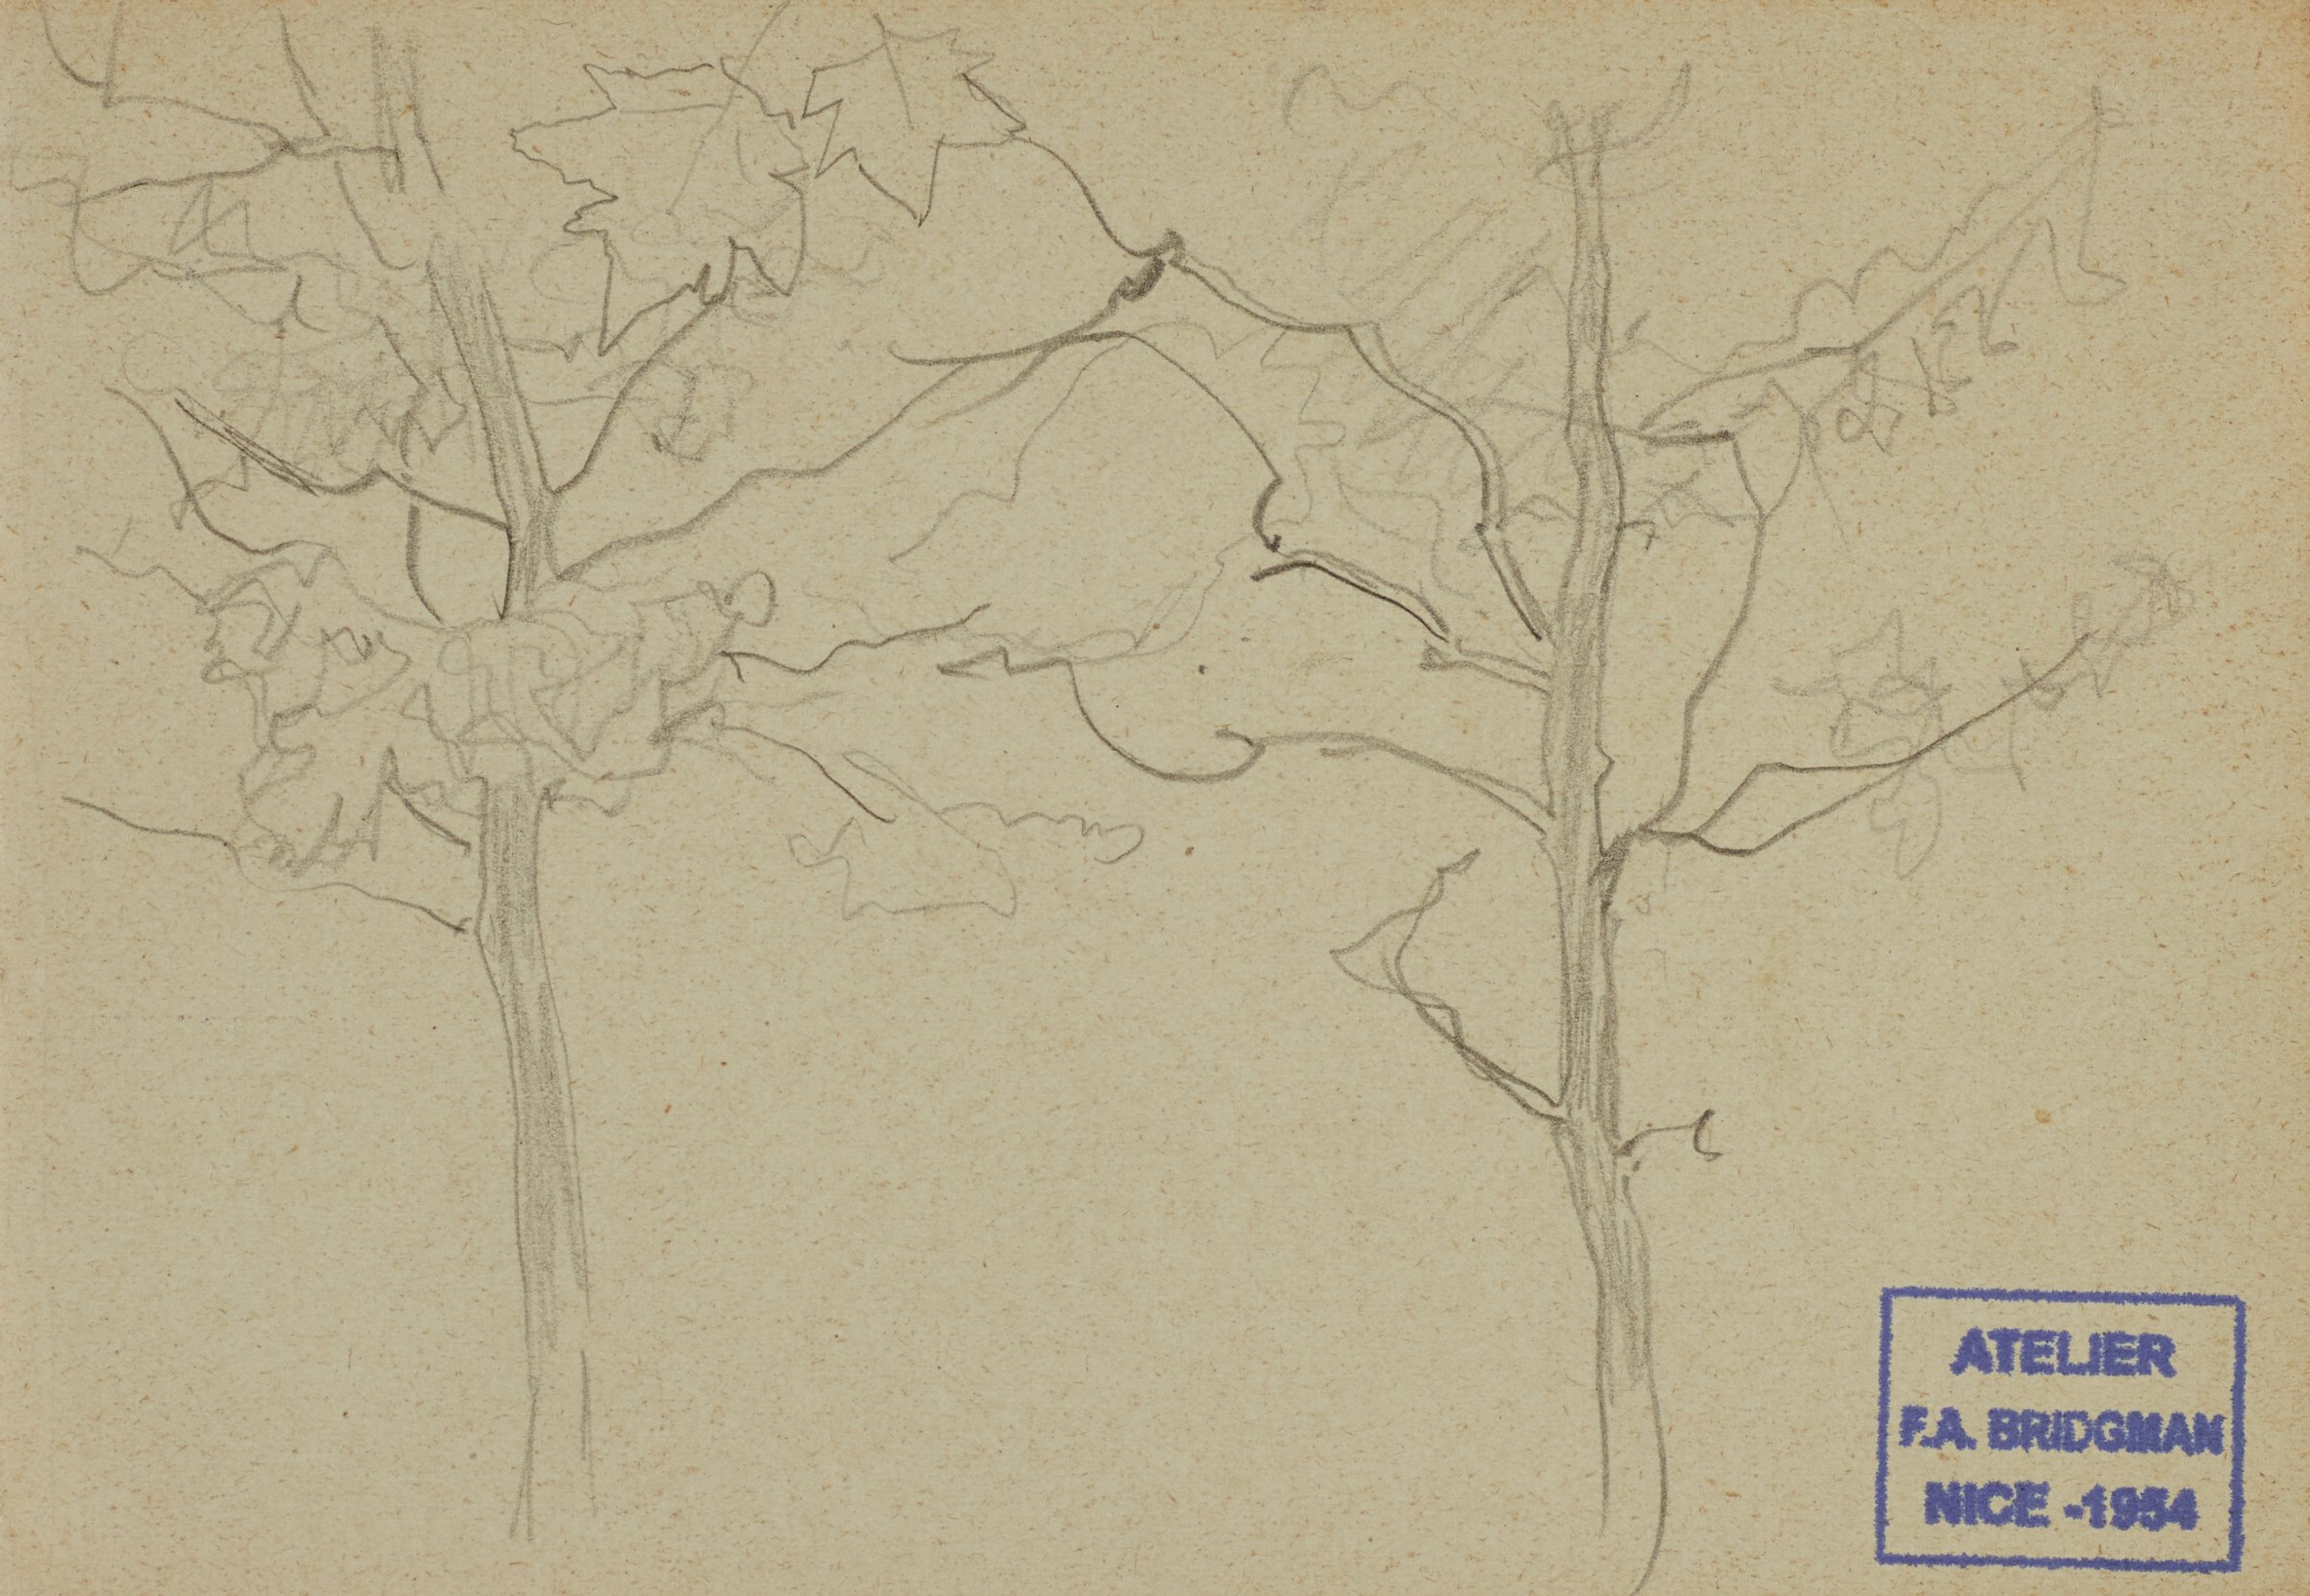 Untitled (Two Trees), Frederic Arthur Bridgman, graphite on paper